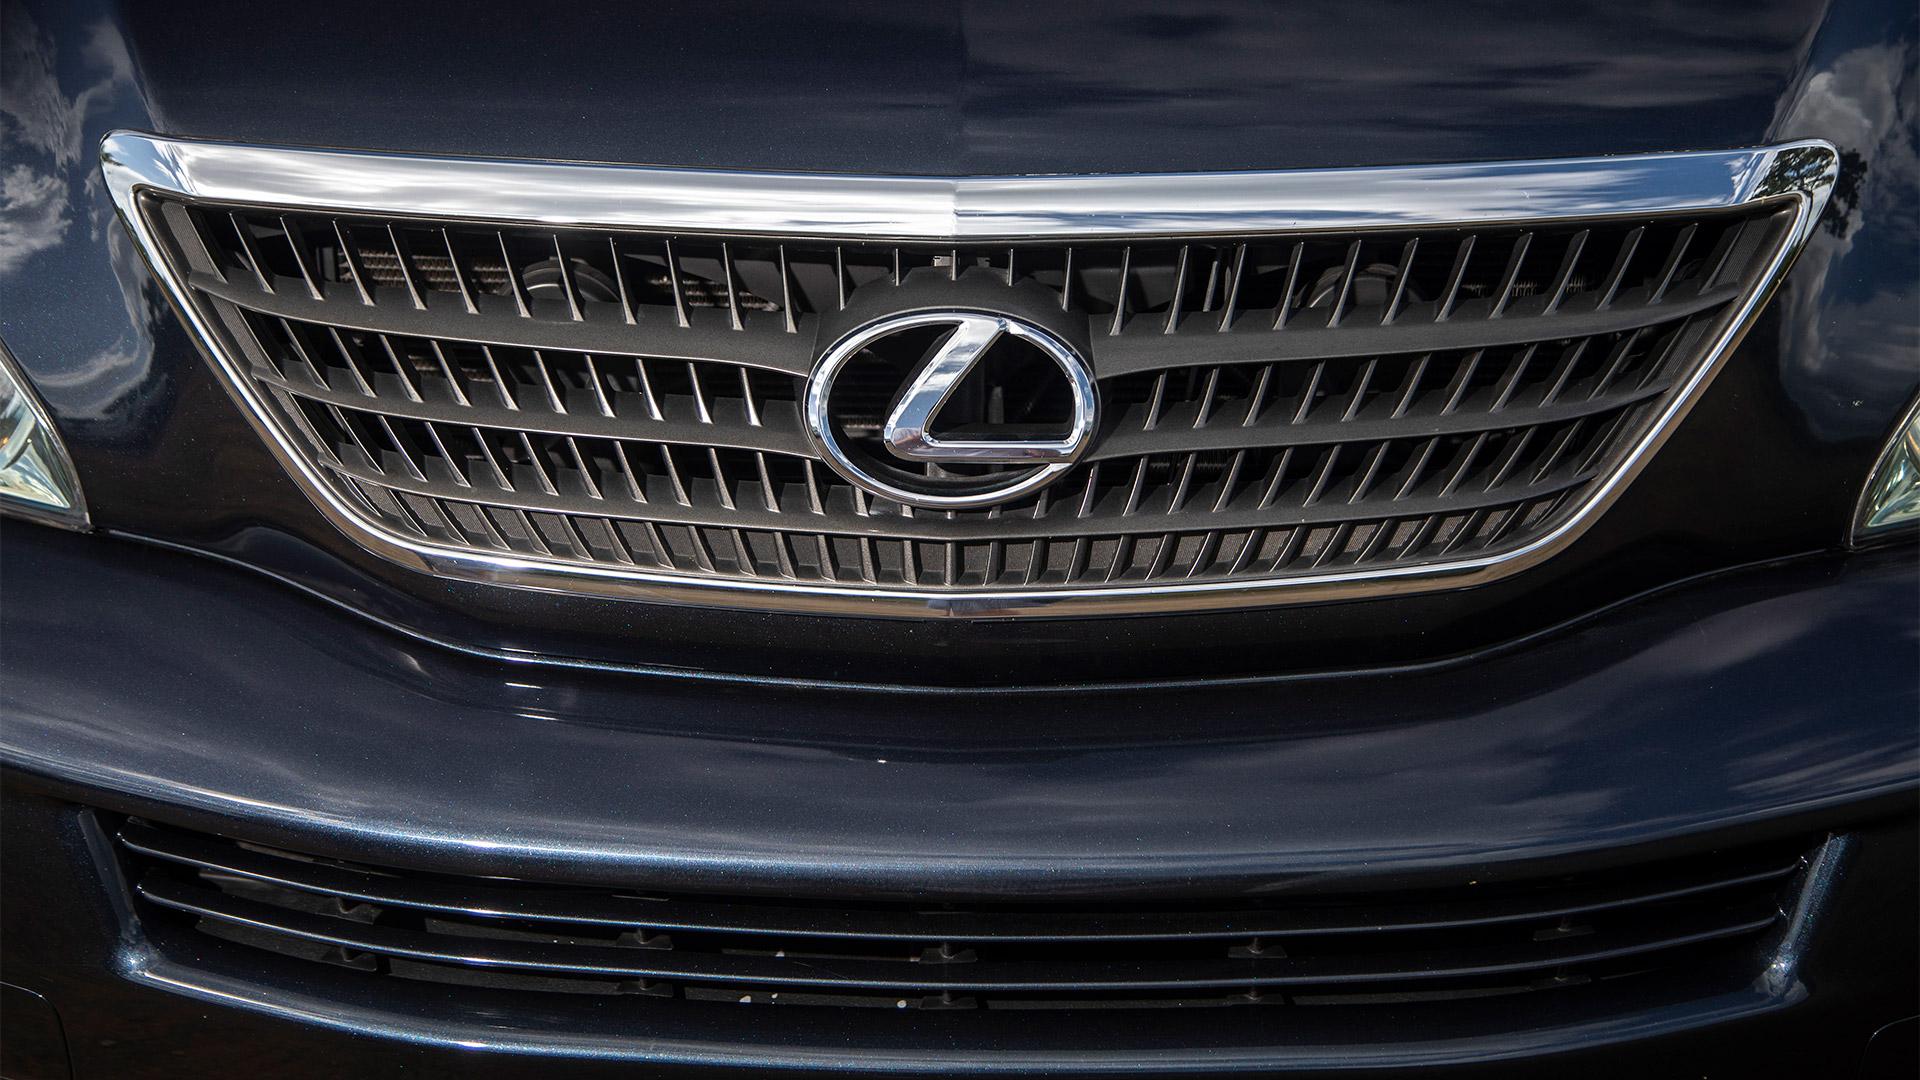 12 2019 020 Lexus RX pionier 1920x1080 galerij